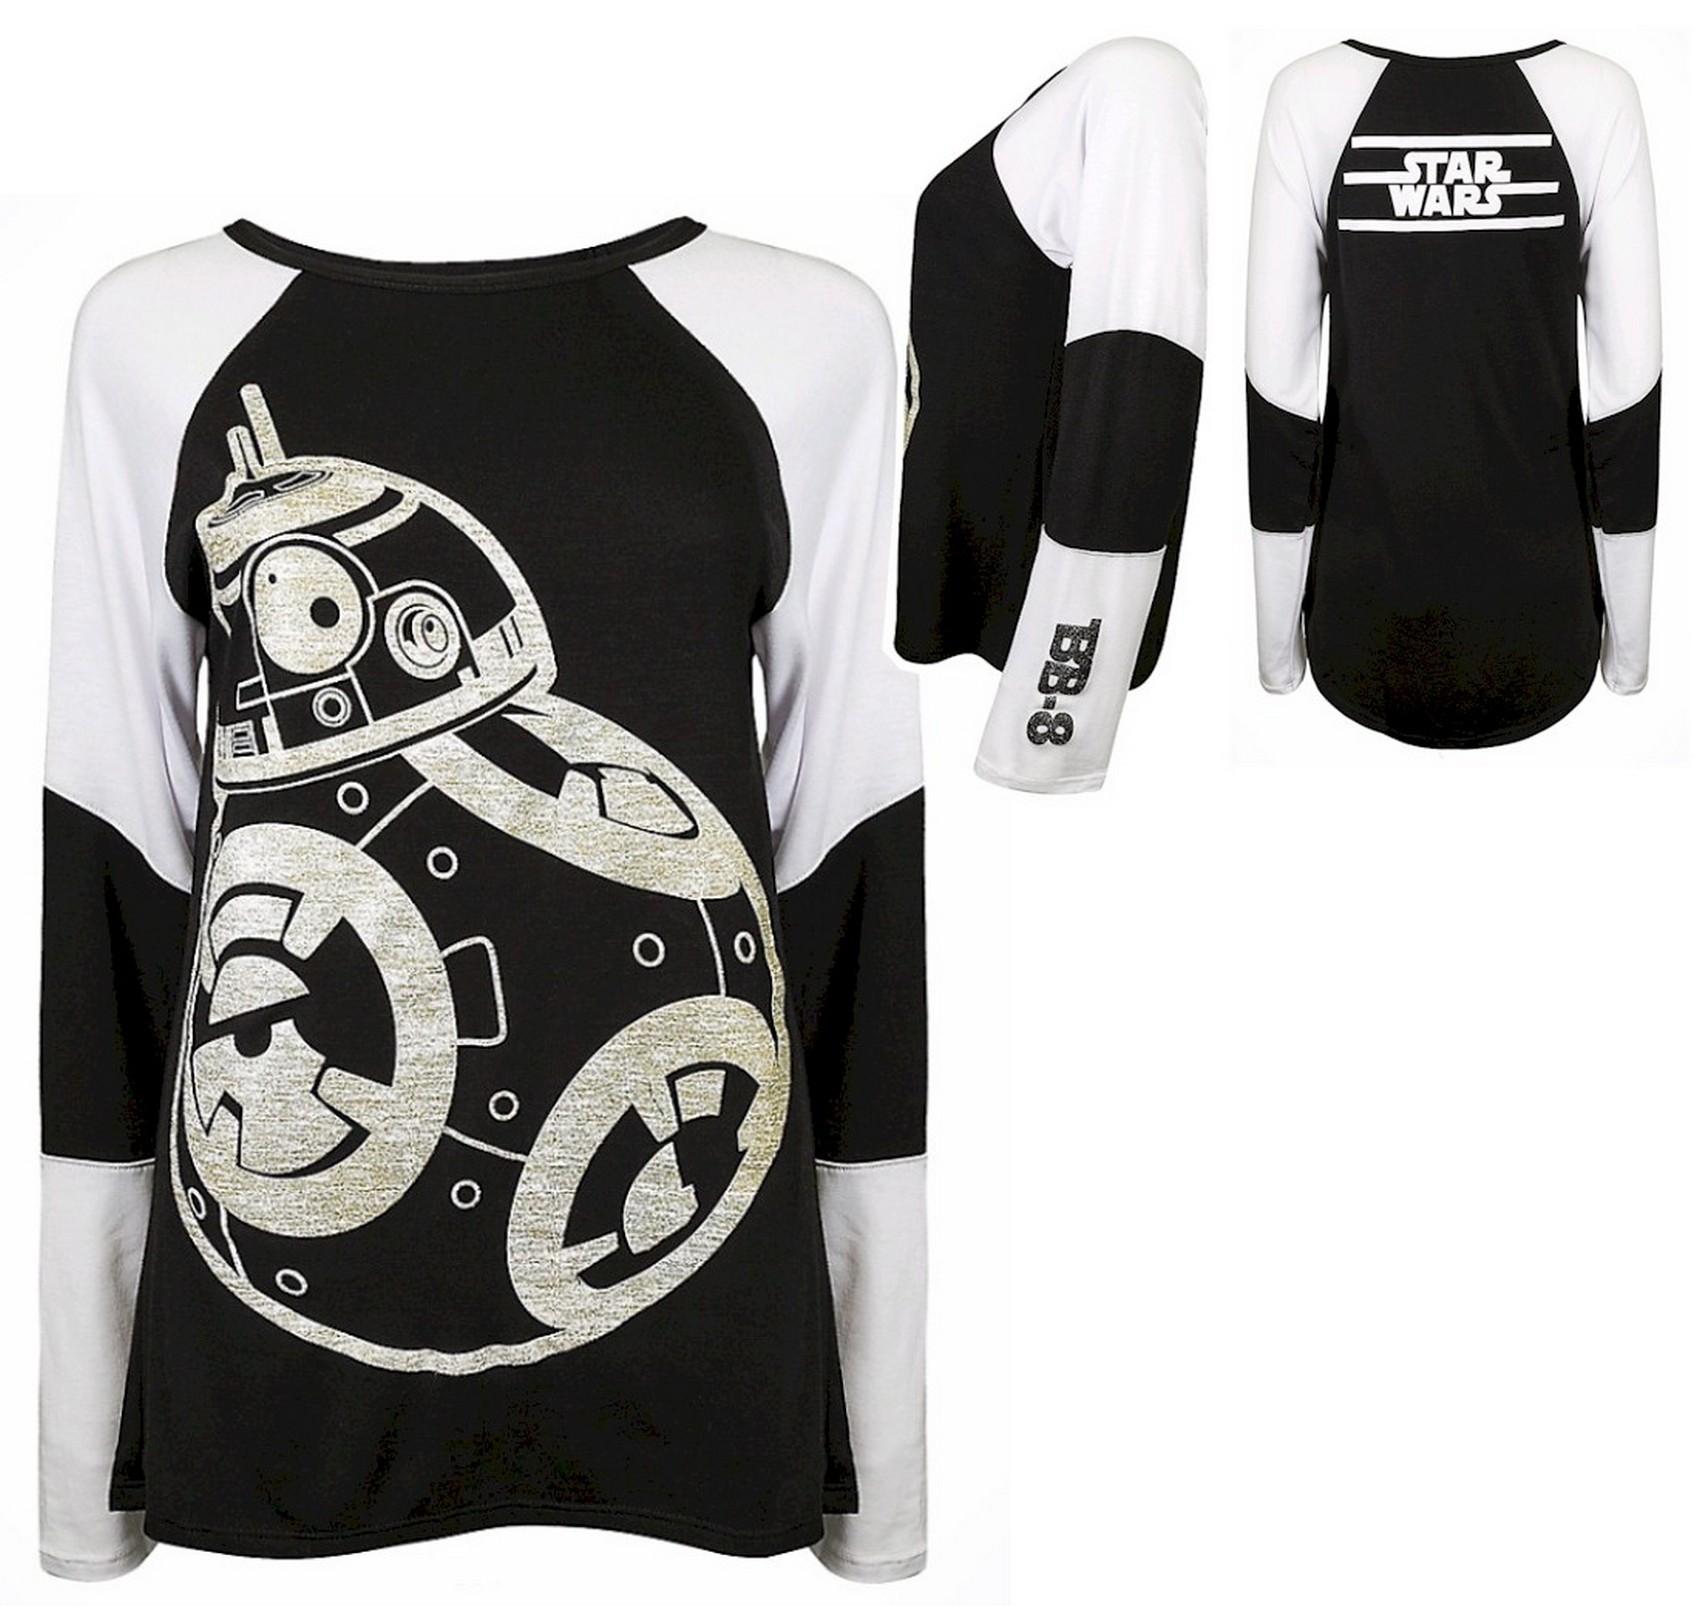 Long Sleeved BB-8 Adult T-shirt (Tee, Tshirt or T shirt) - Disney Star Wars: The Last Jedi © Dizdude.com